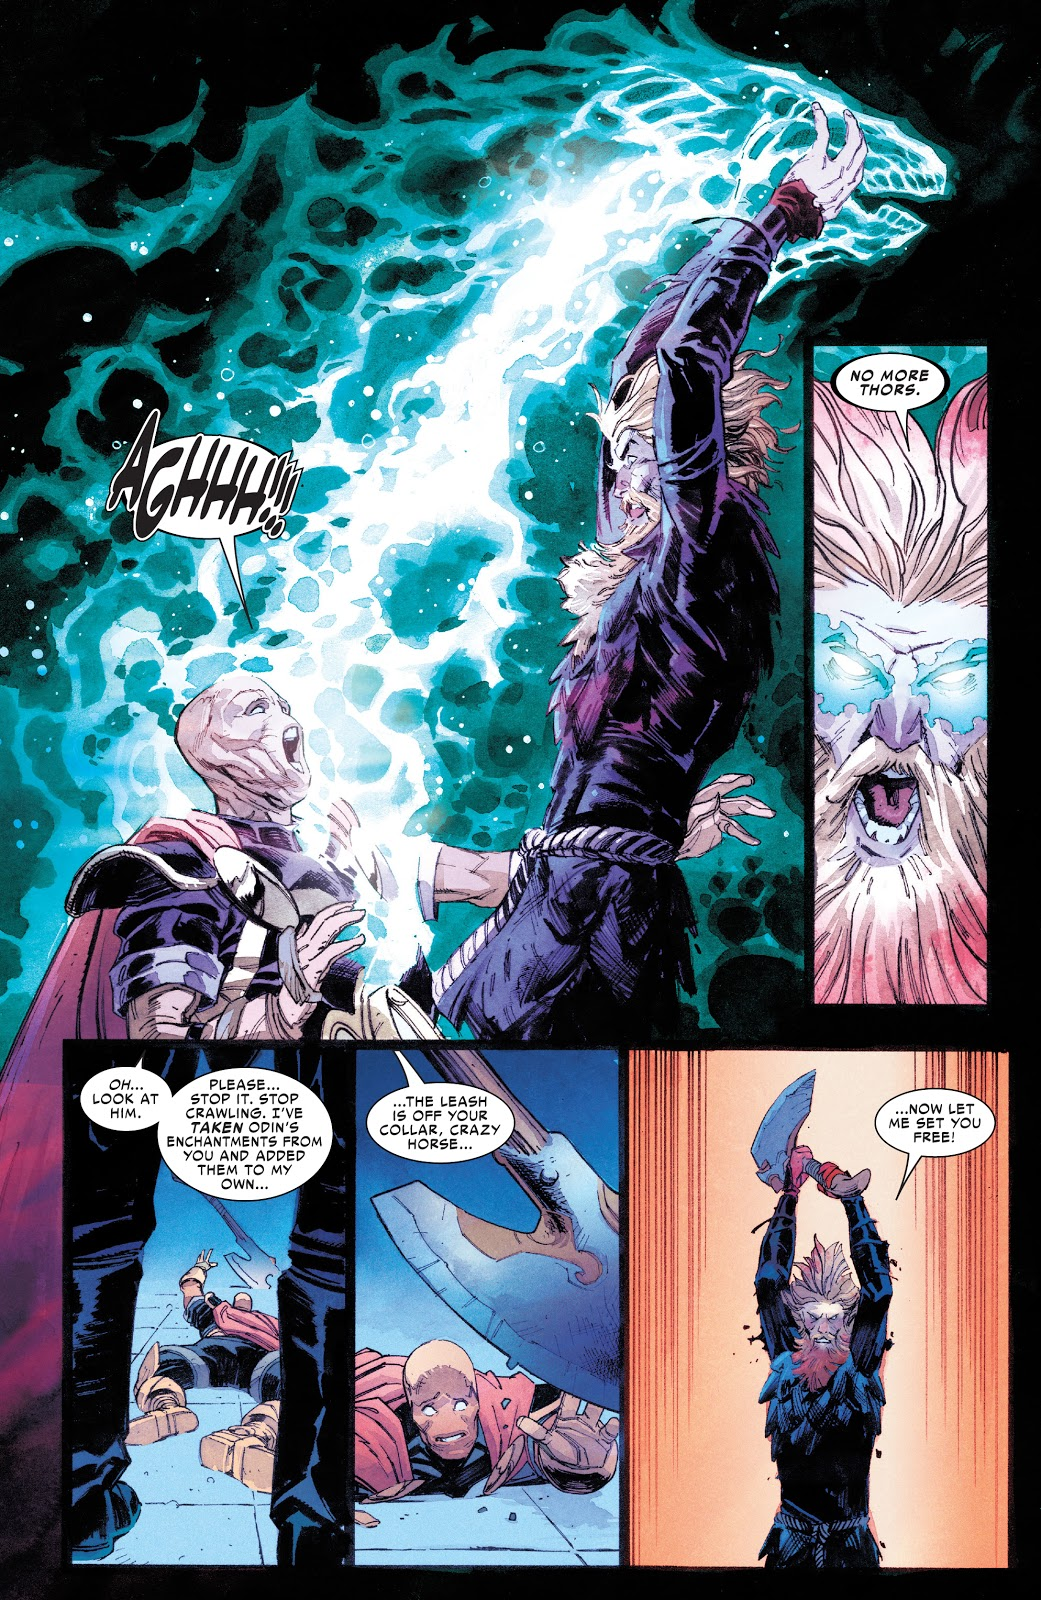 Donald Blake Defeats The Entire Asgardian Army